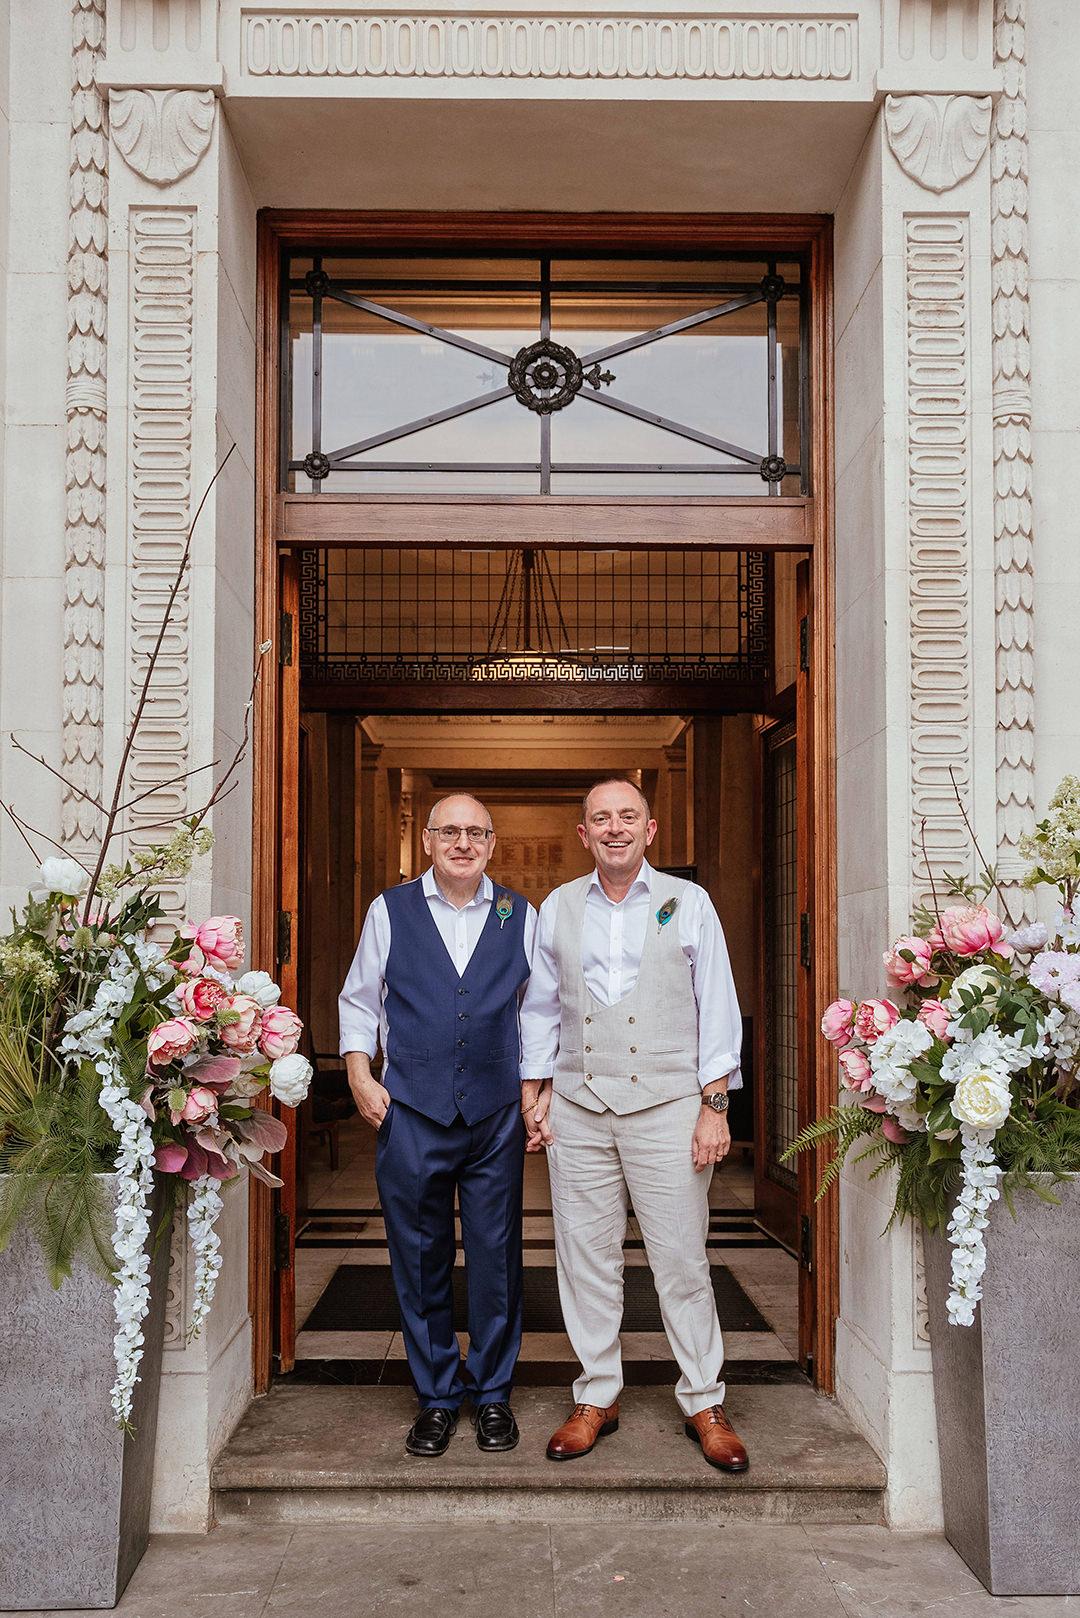 Mr and Mr Old Marylebone Town Hall Wedding